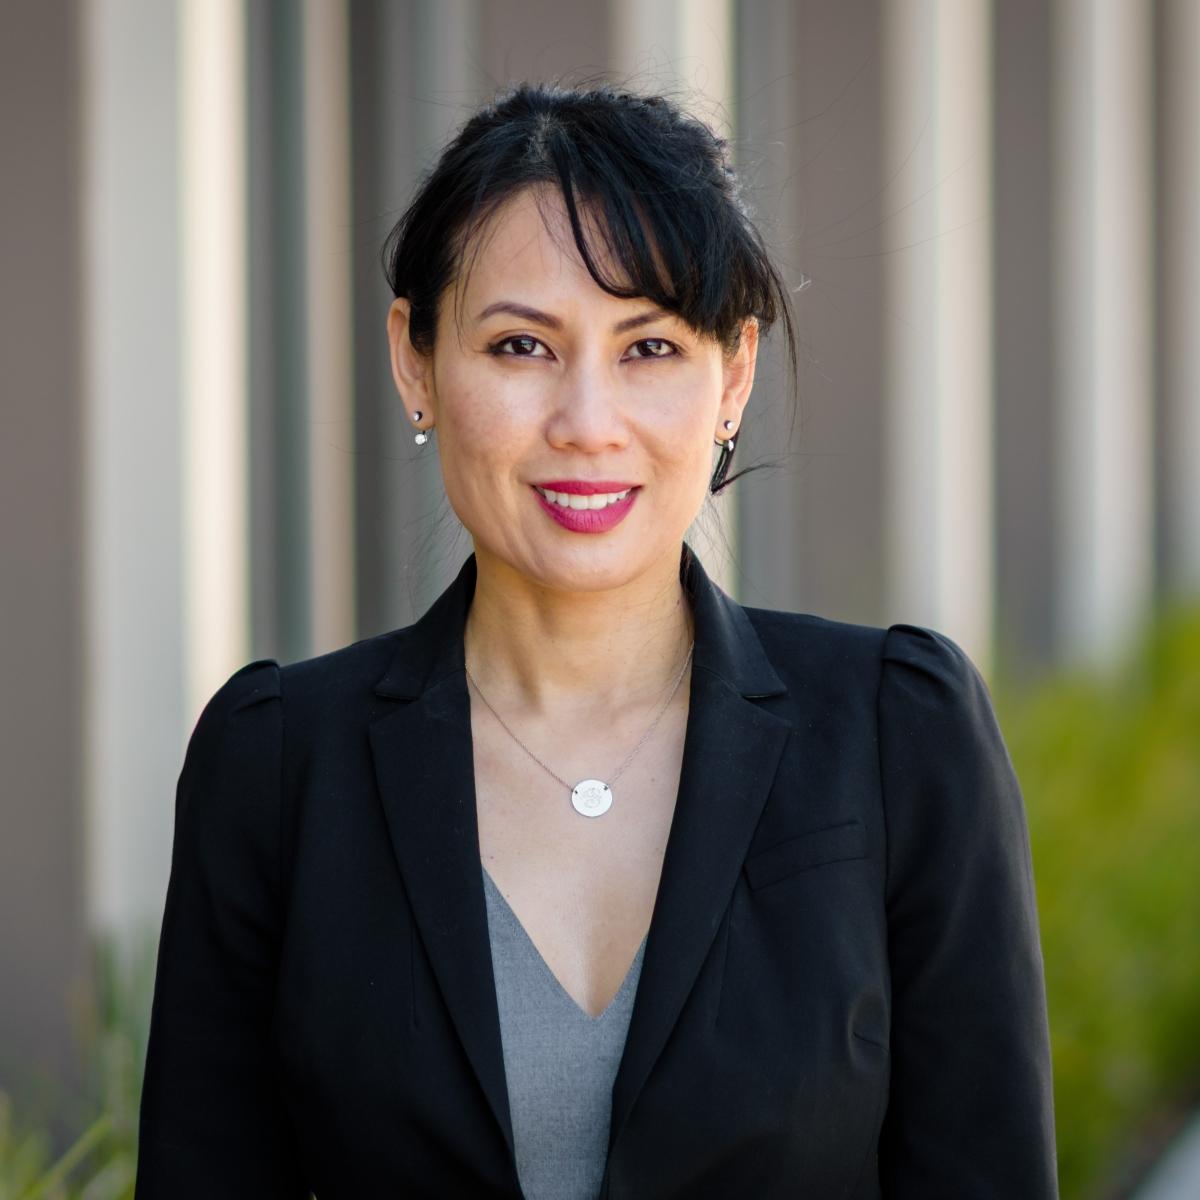 Juliette D. Nguyen